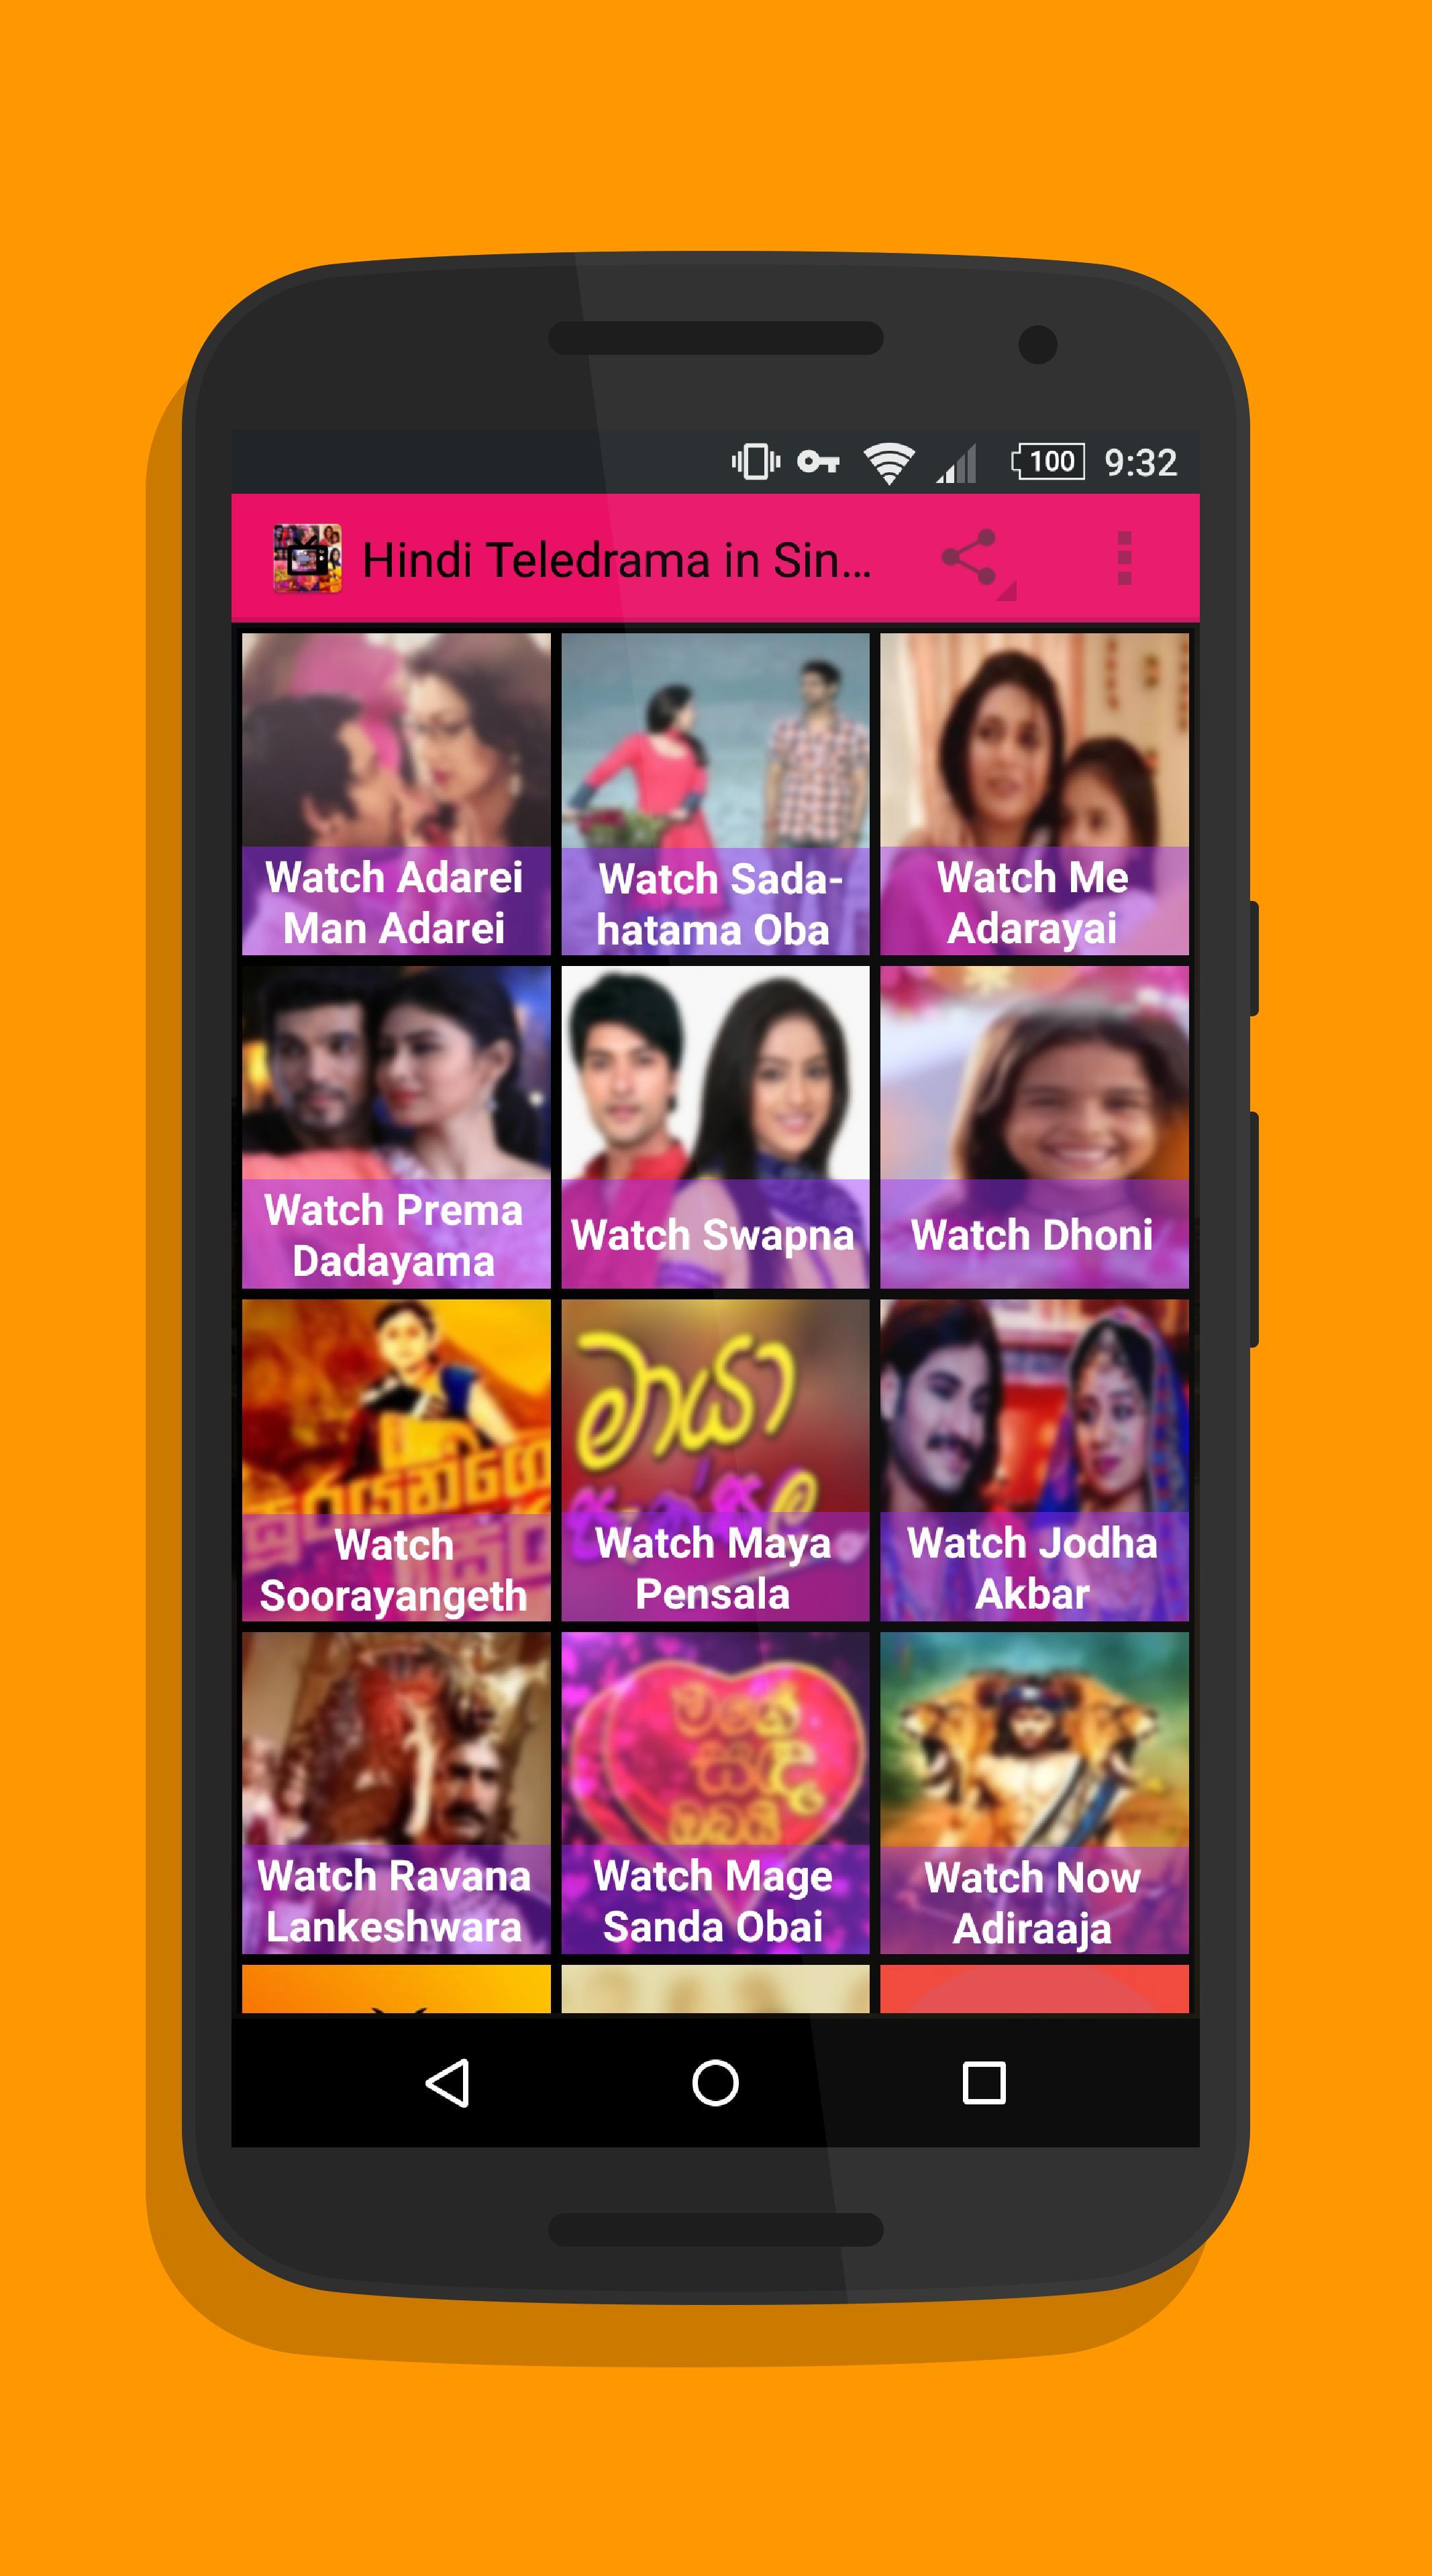 Hindi Teledrama in Sinhala for Android - APK Download